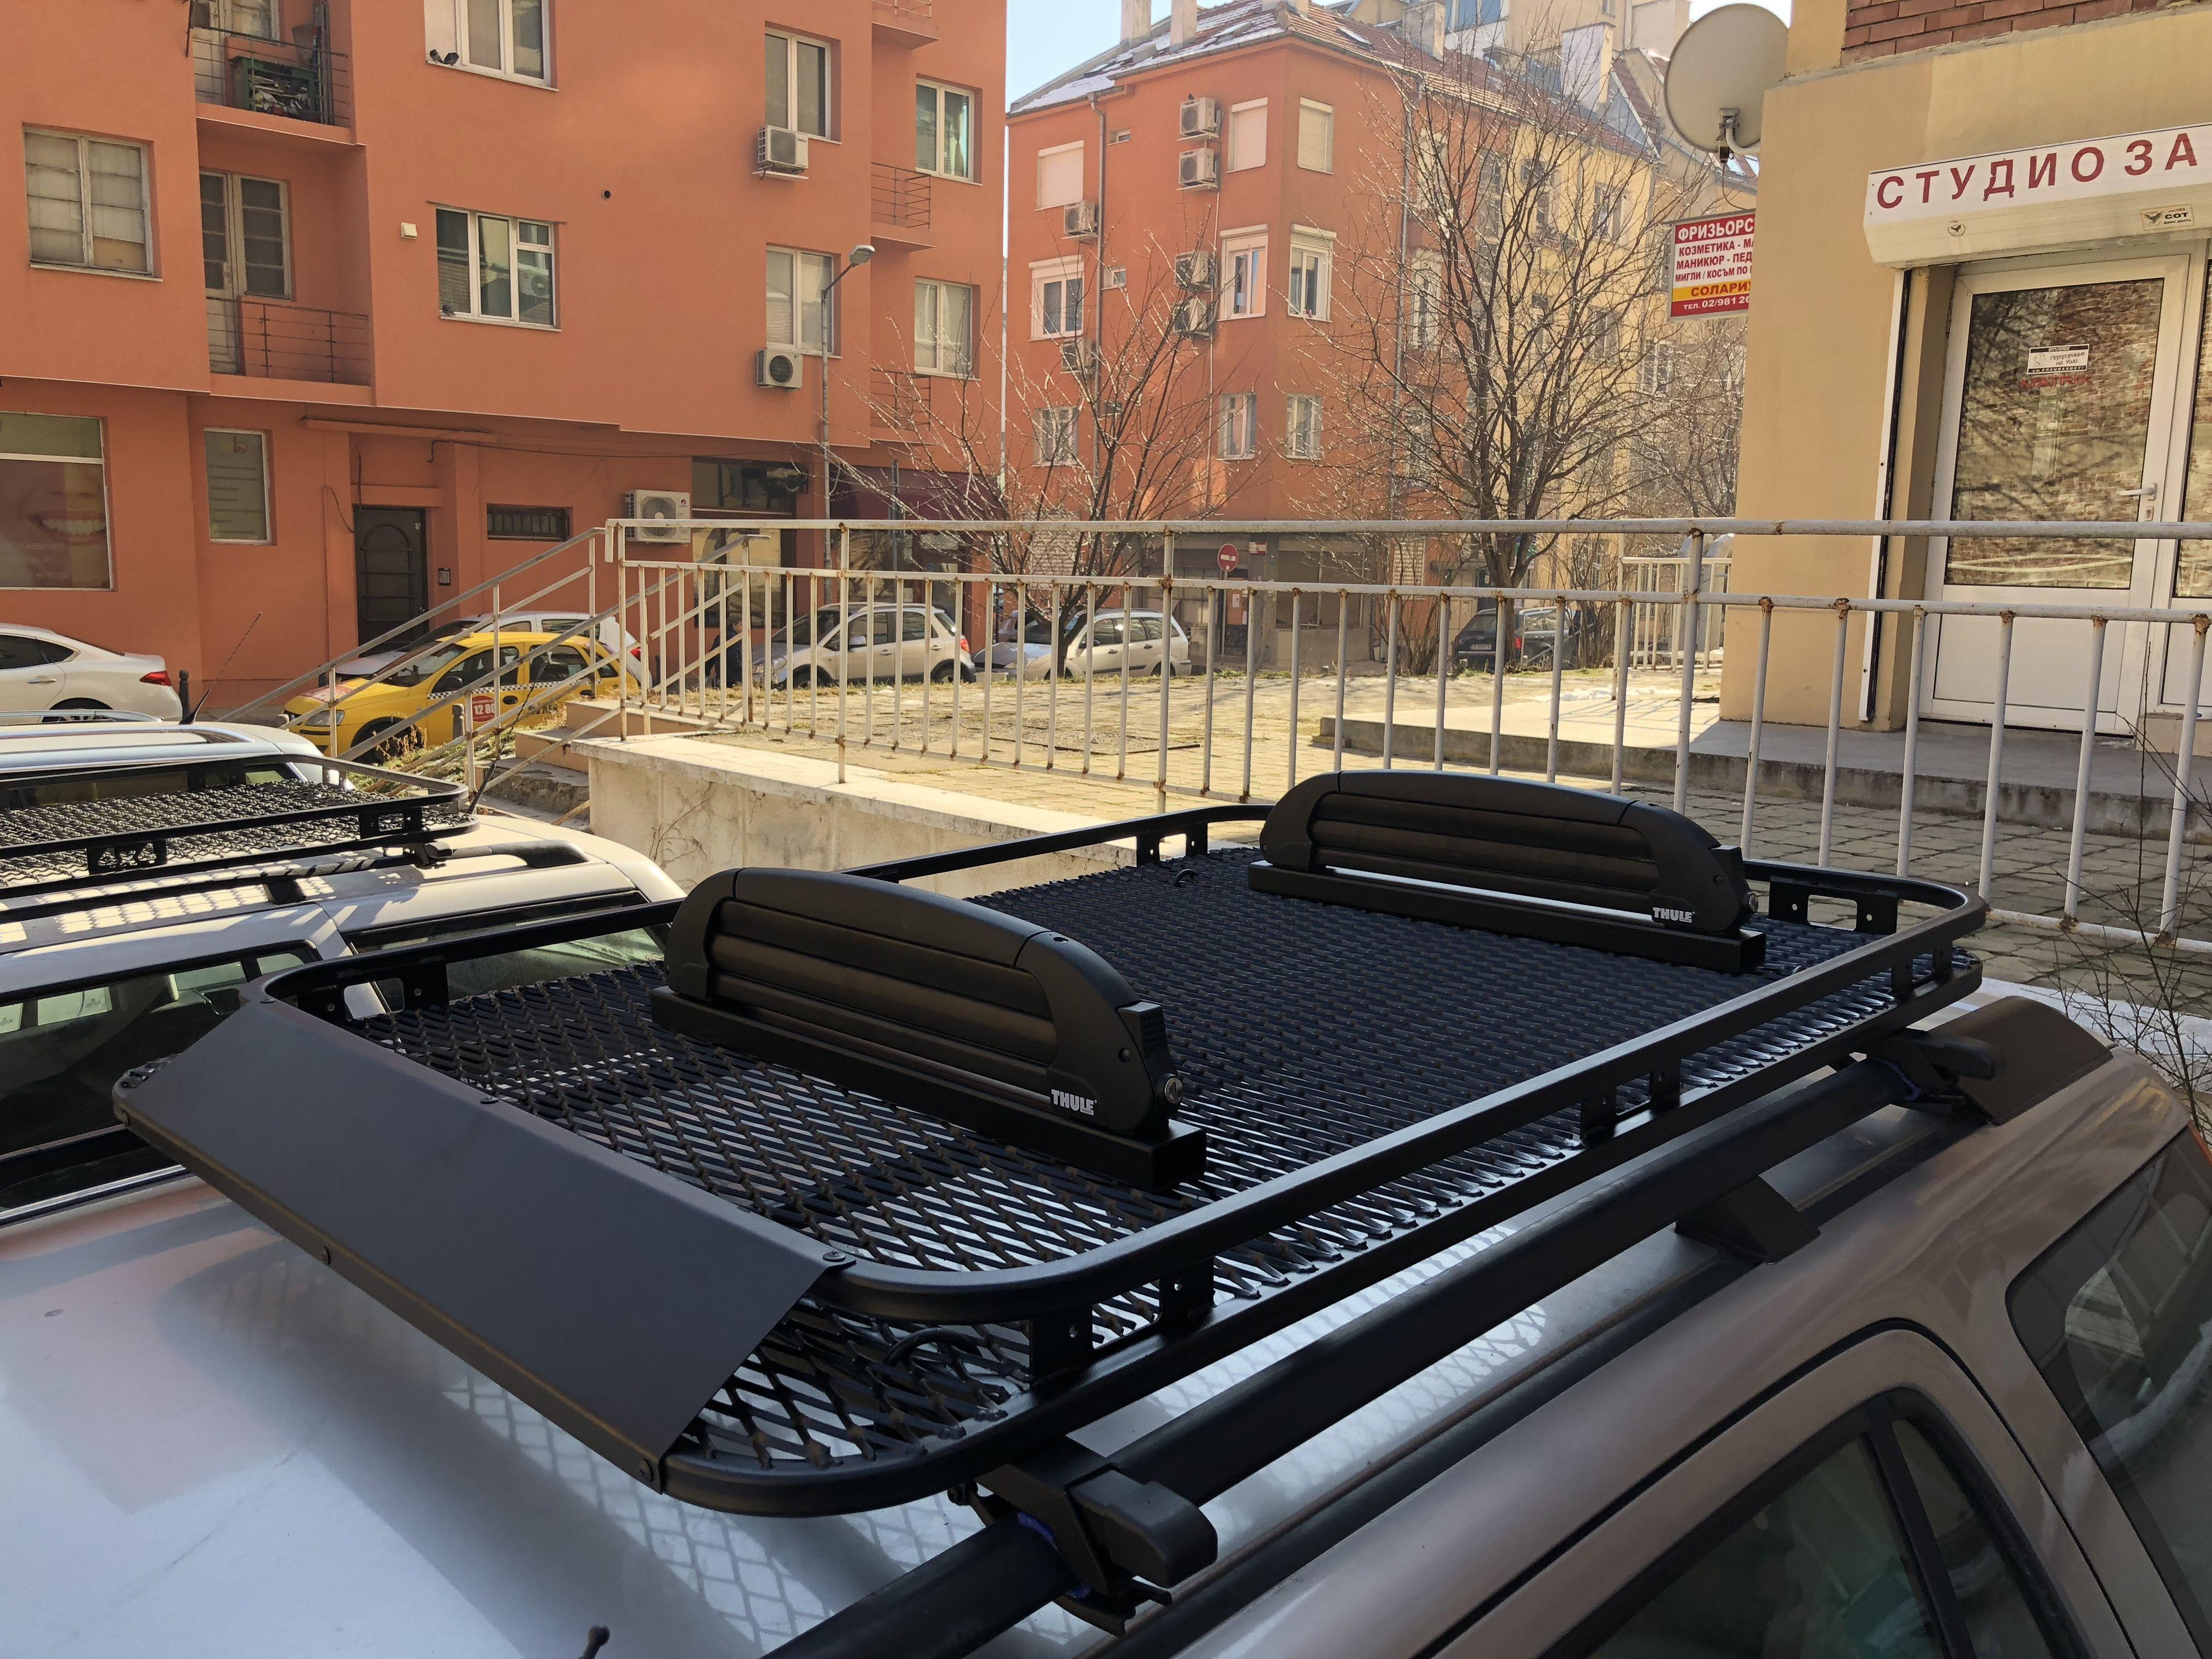 Top Roof Rack Honda Crv Roof Rack Honda Crv Honda Crv Accessories